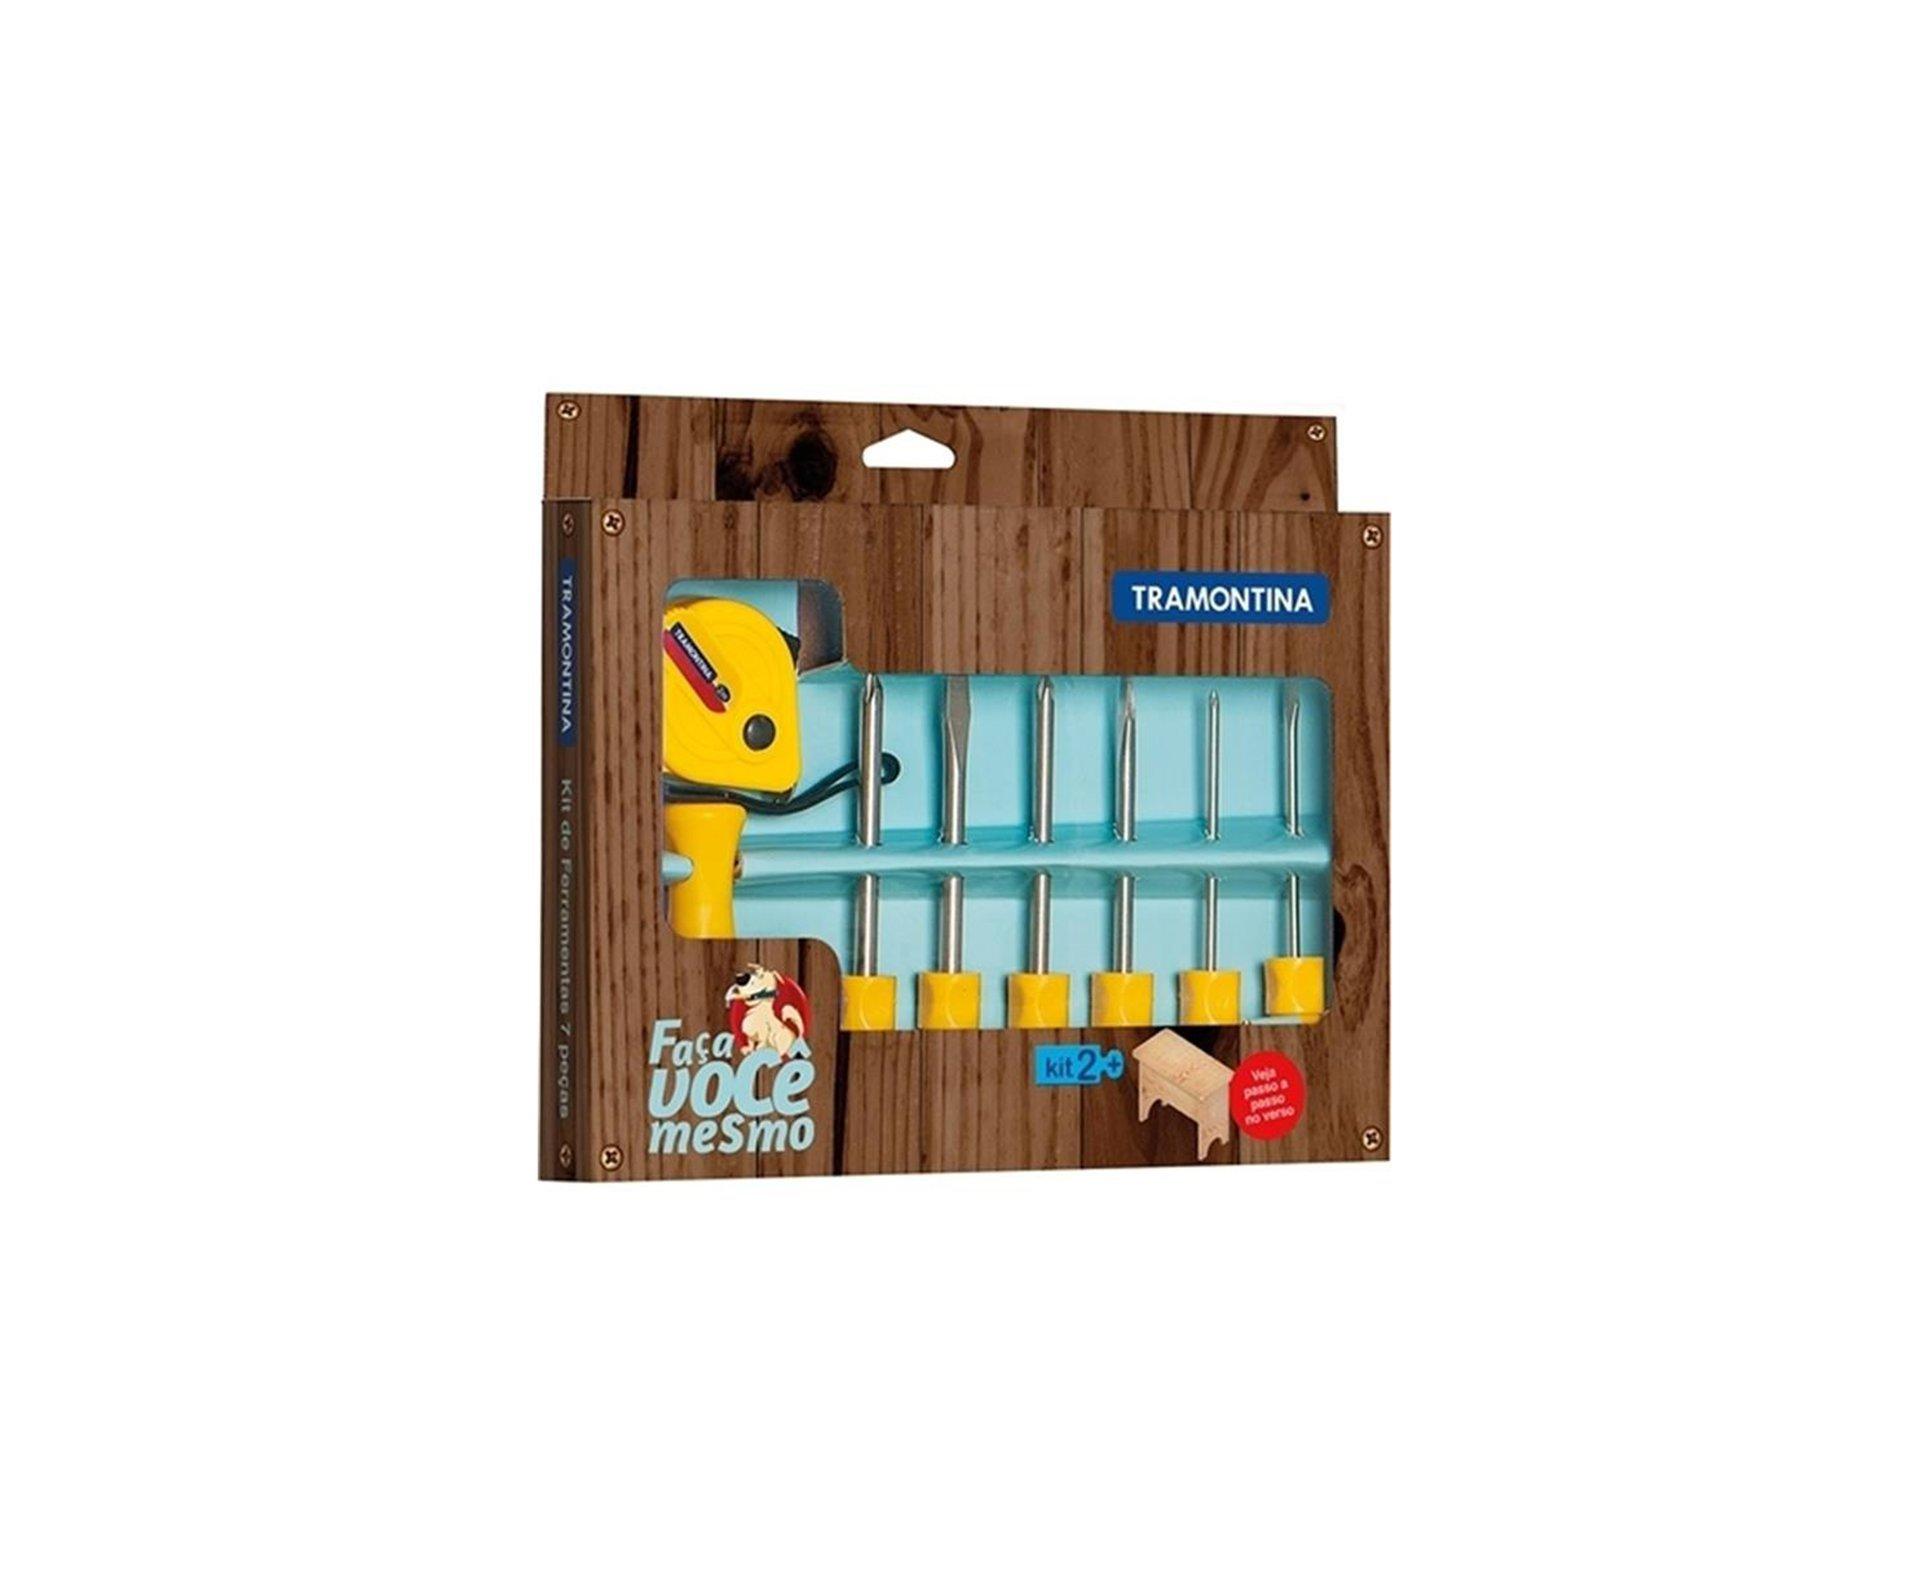 Conjunto De Ferramentas Tramontina 43408421 Amarelo - 7 Peças